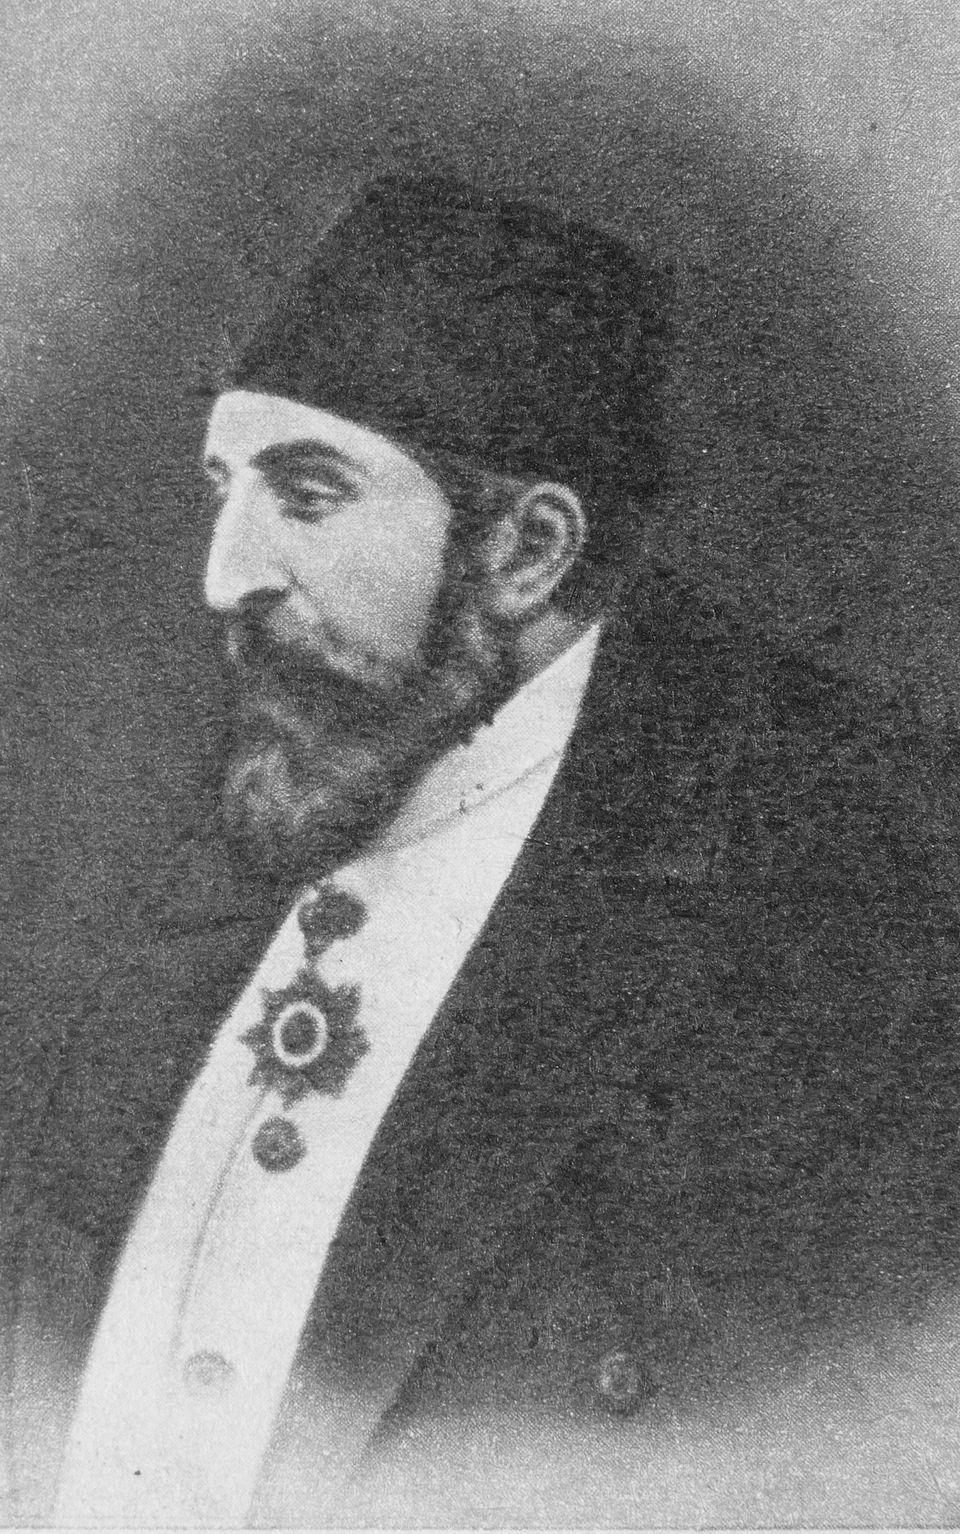 O Αμπντούλ Χαμίτ